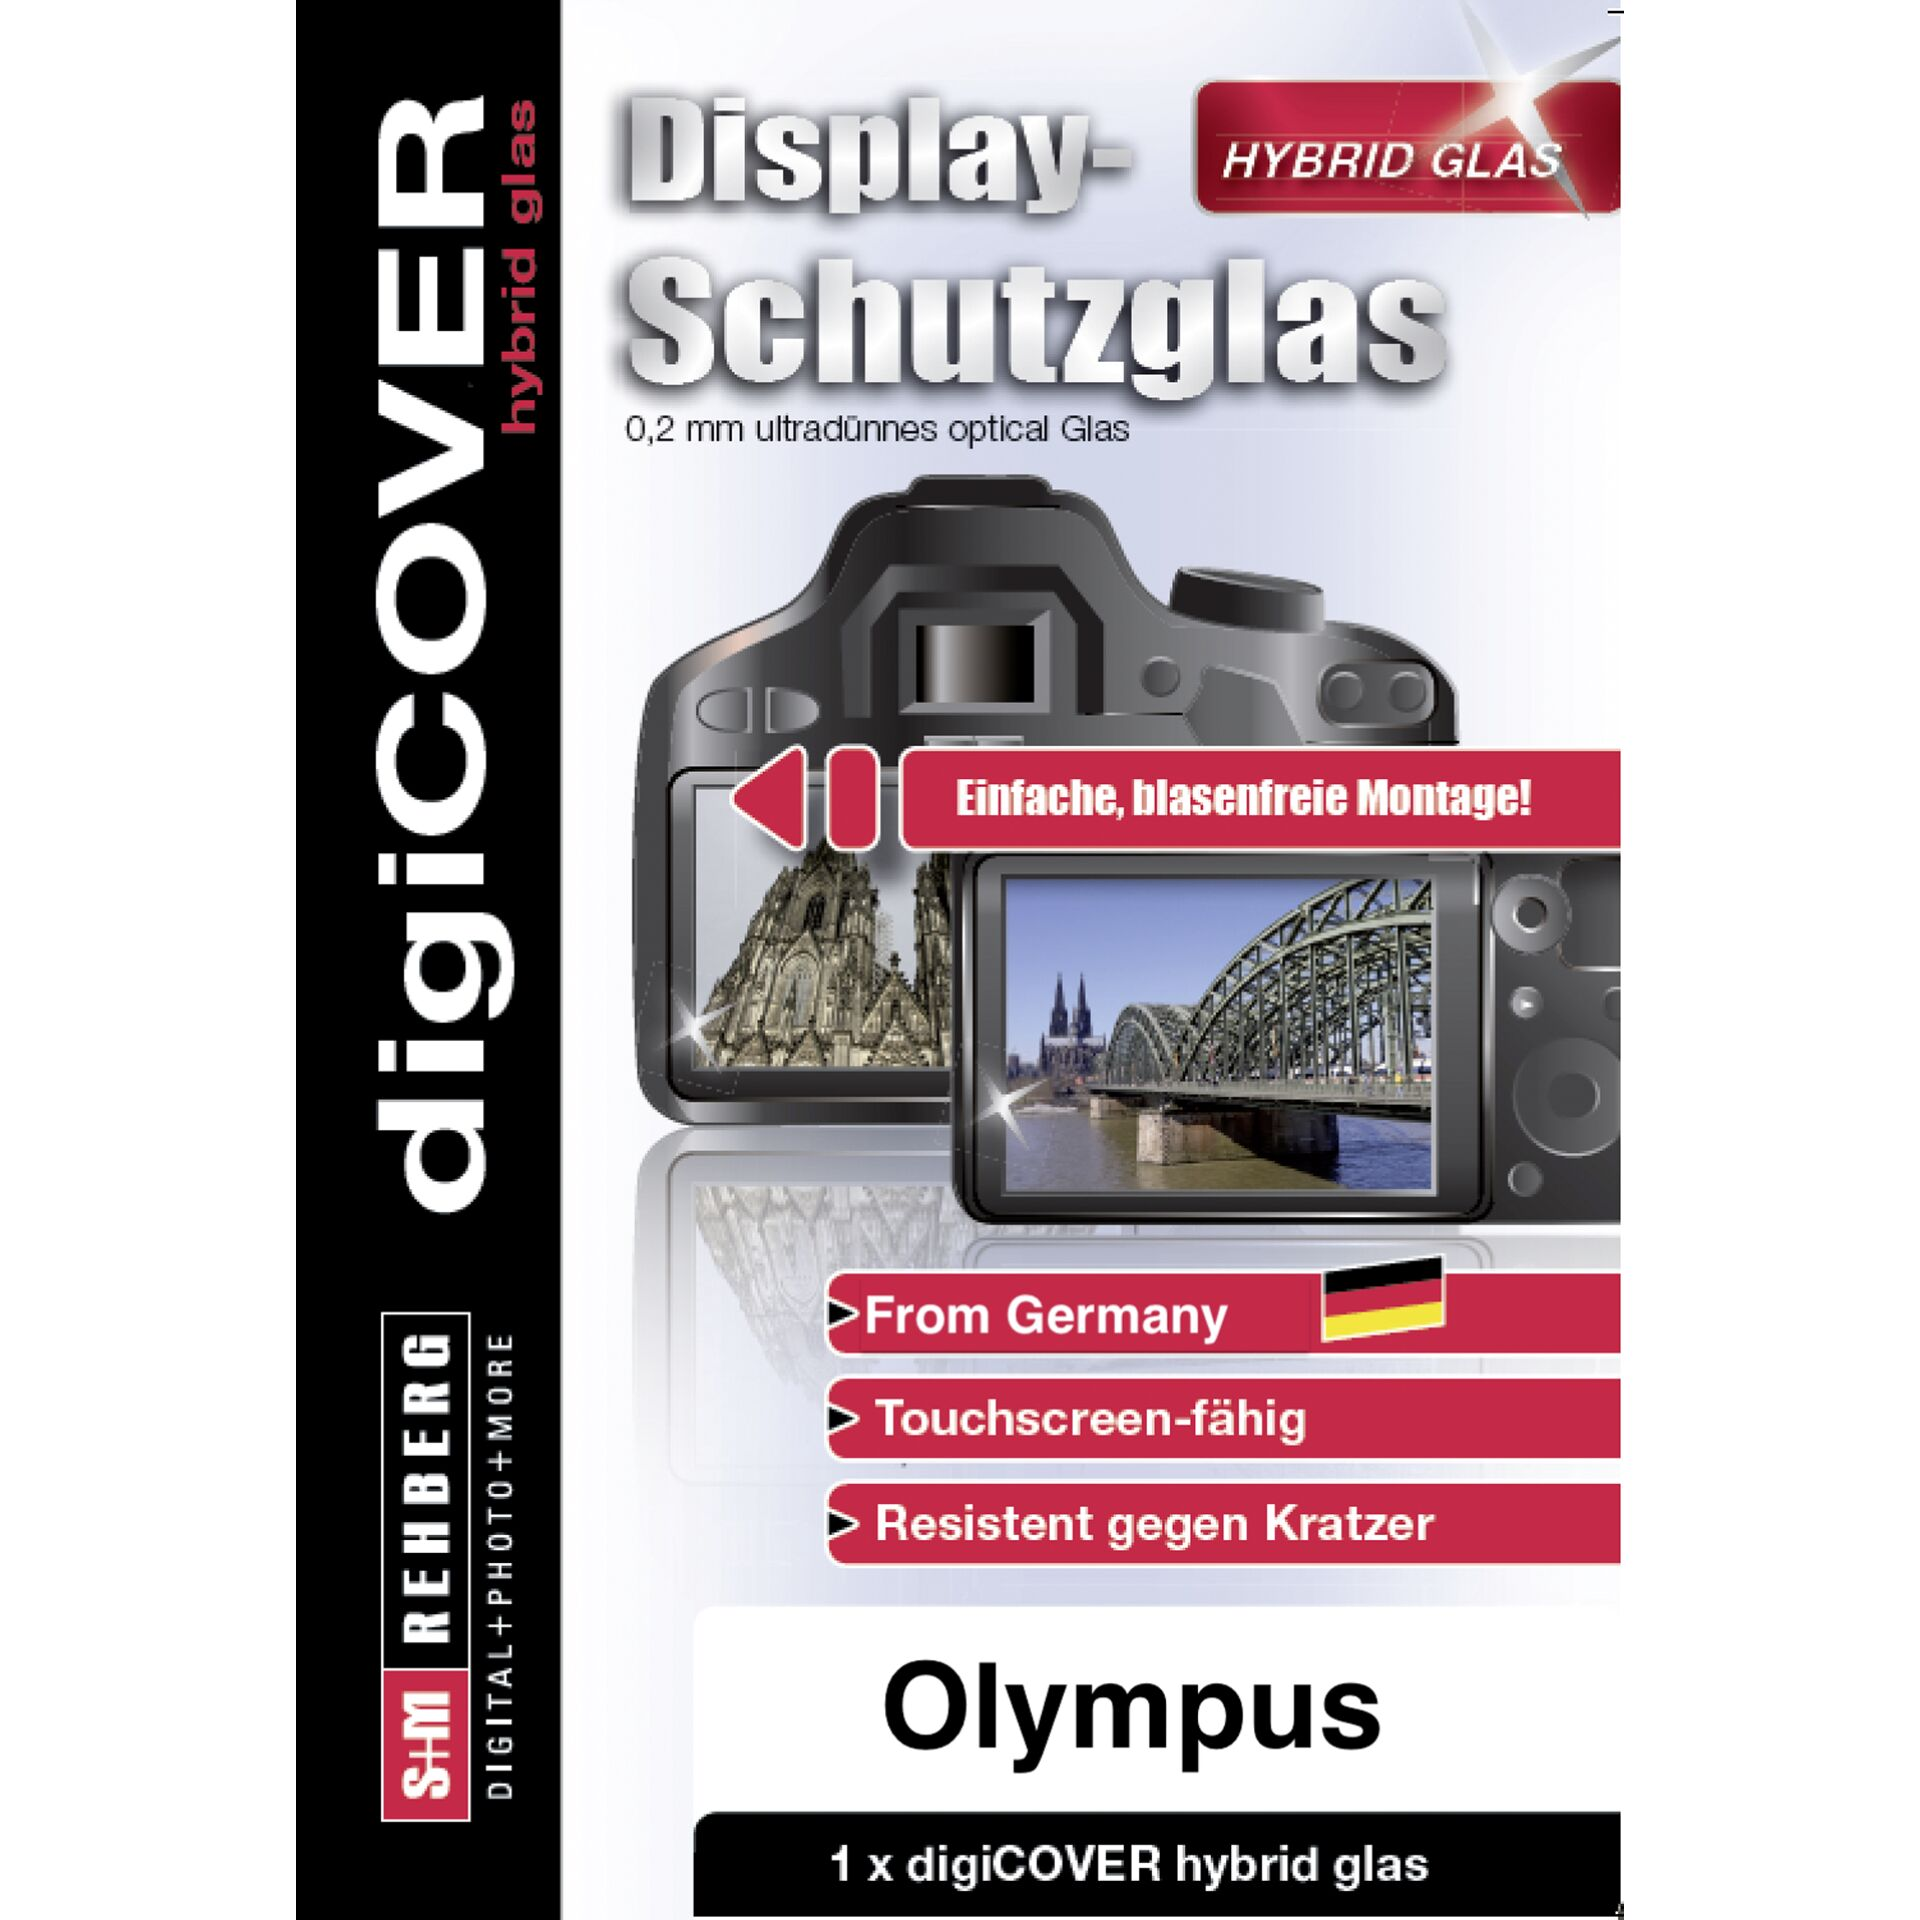 DigiCOVER Hybrid Glass Display Cover Olympus OM-D E-M1 MK IV